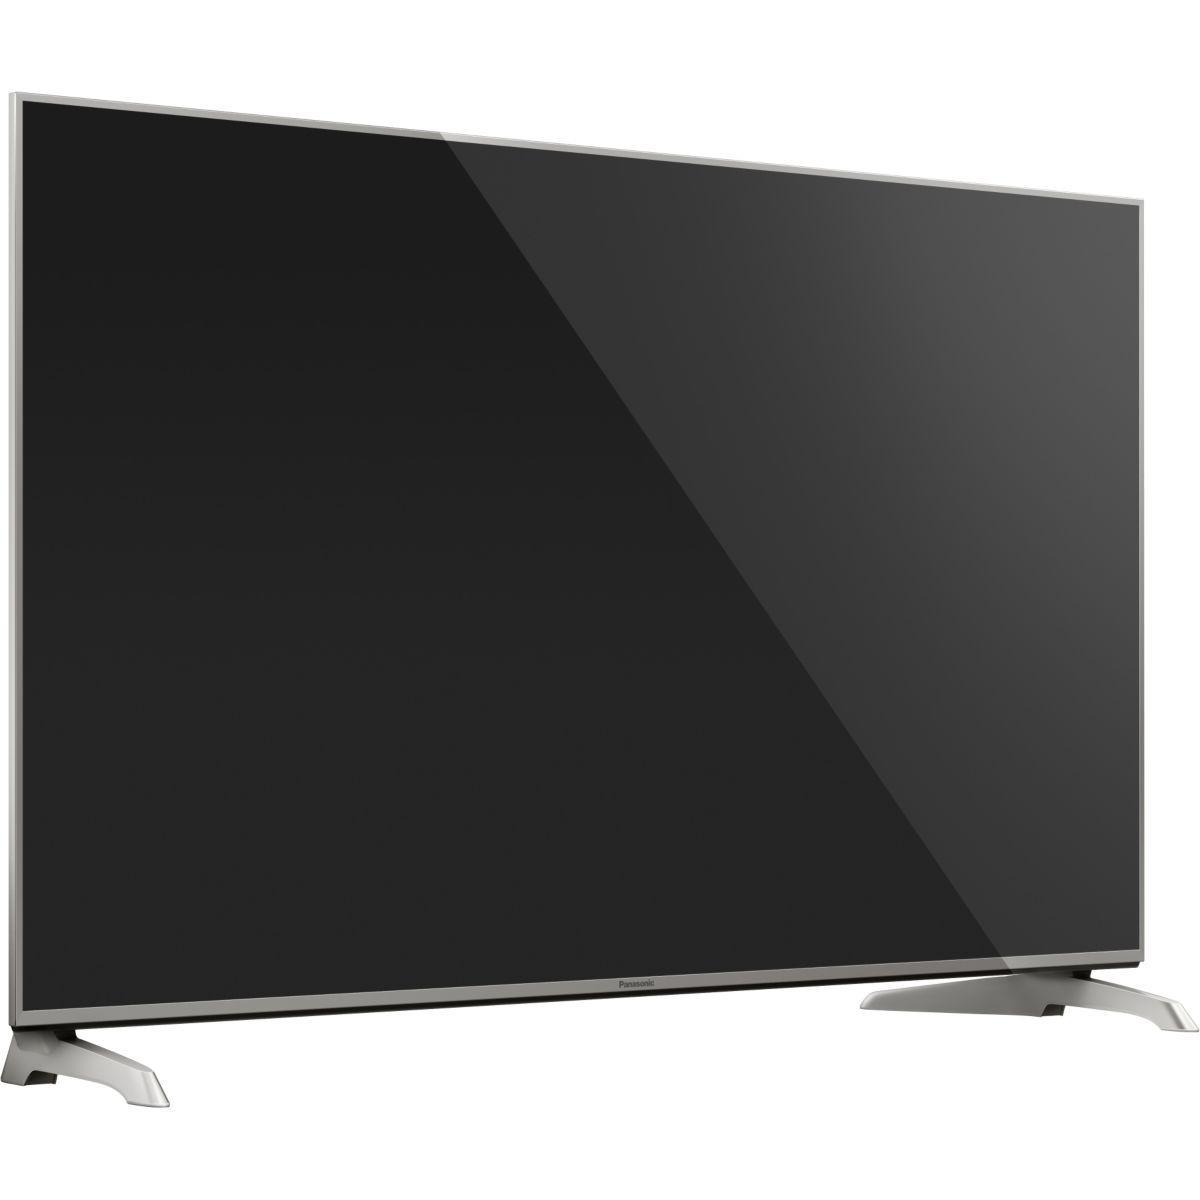 TV PANASONIC TX-50DXE720 4K 1400Hz BMR SMART TV